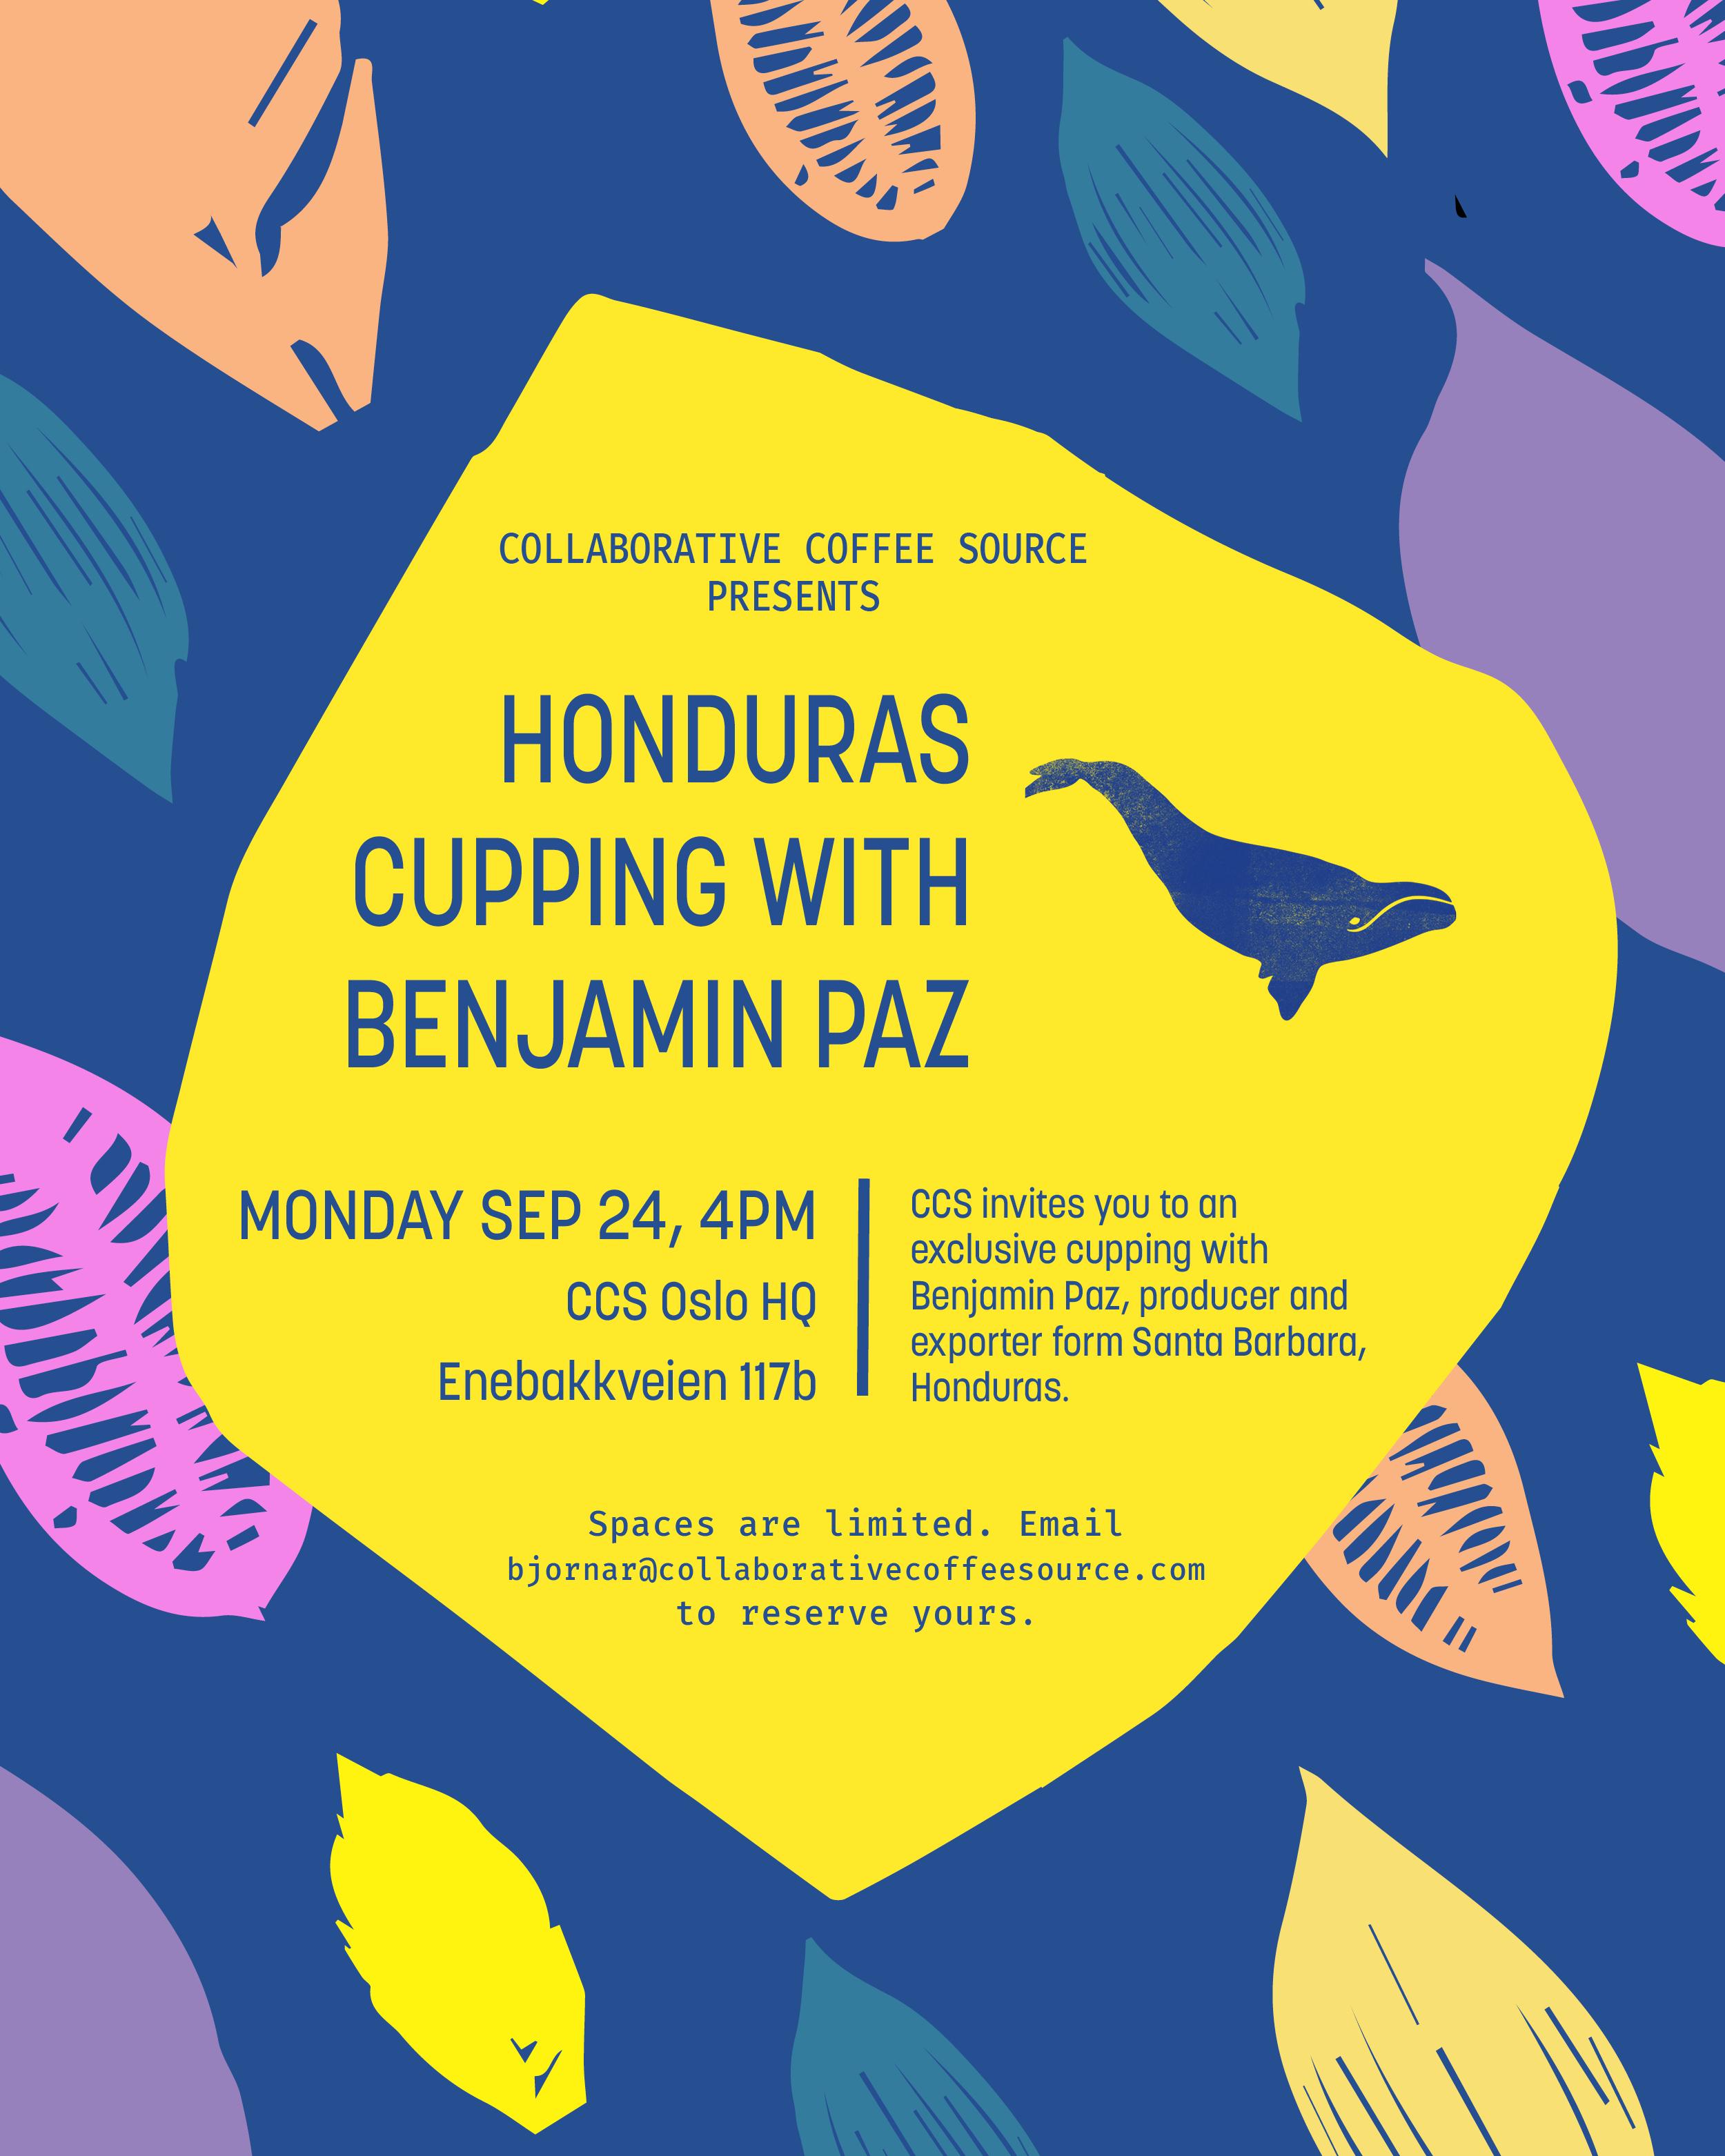 Honduras Cupping with Benjamin Poster.jpg